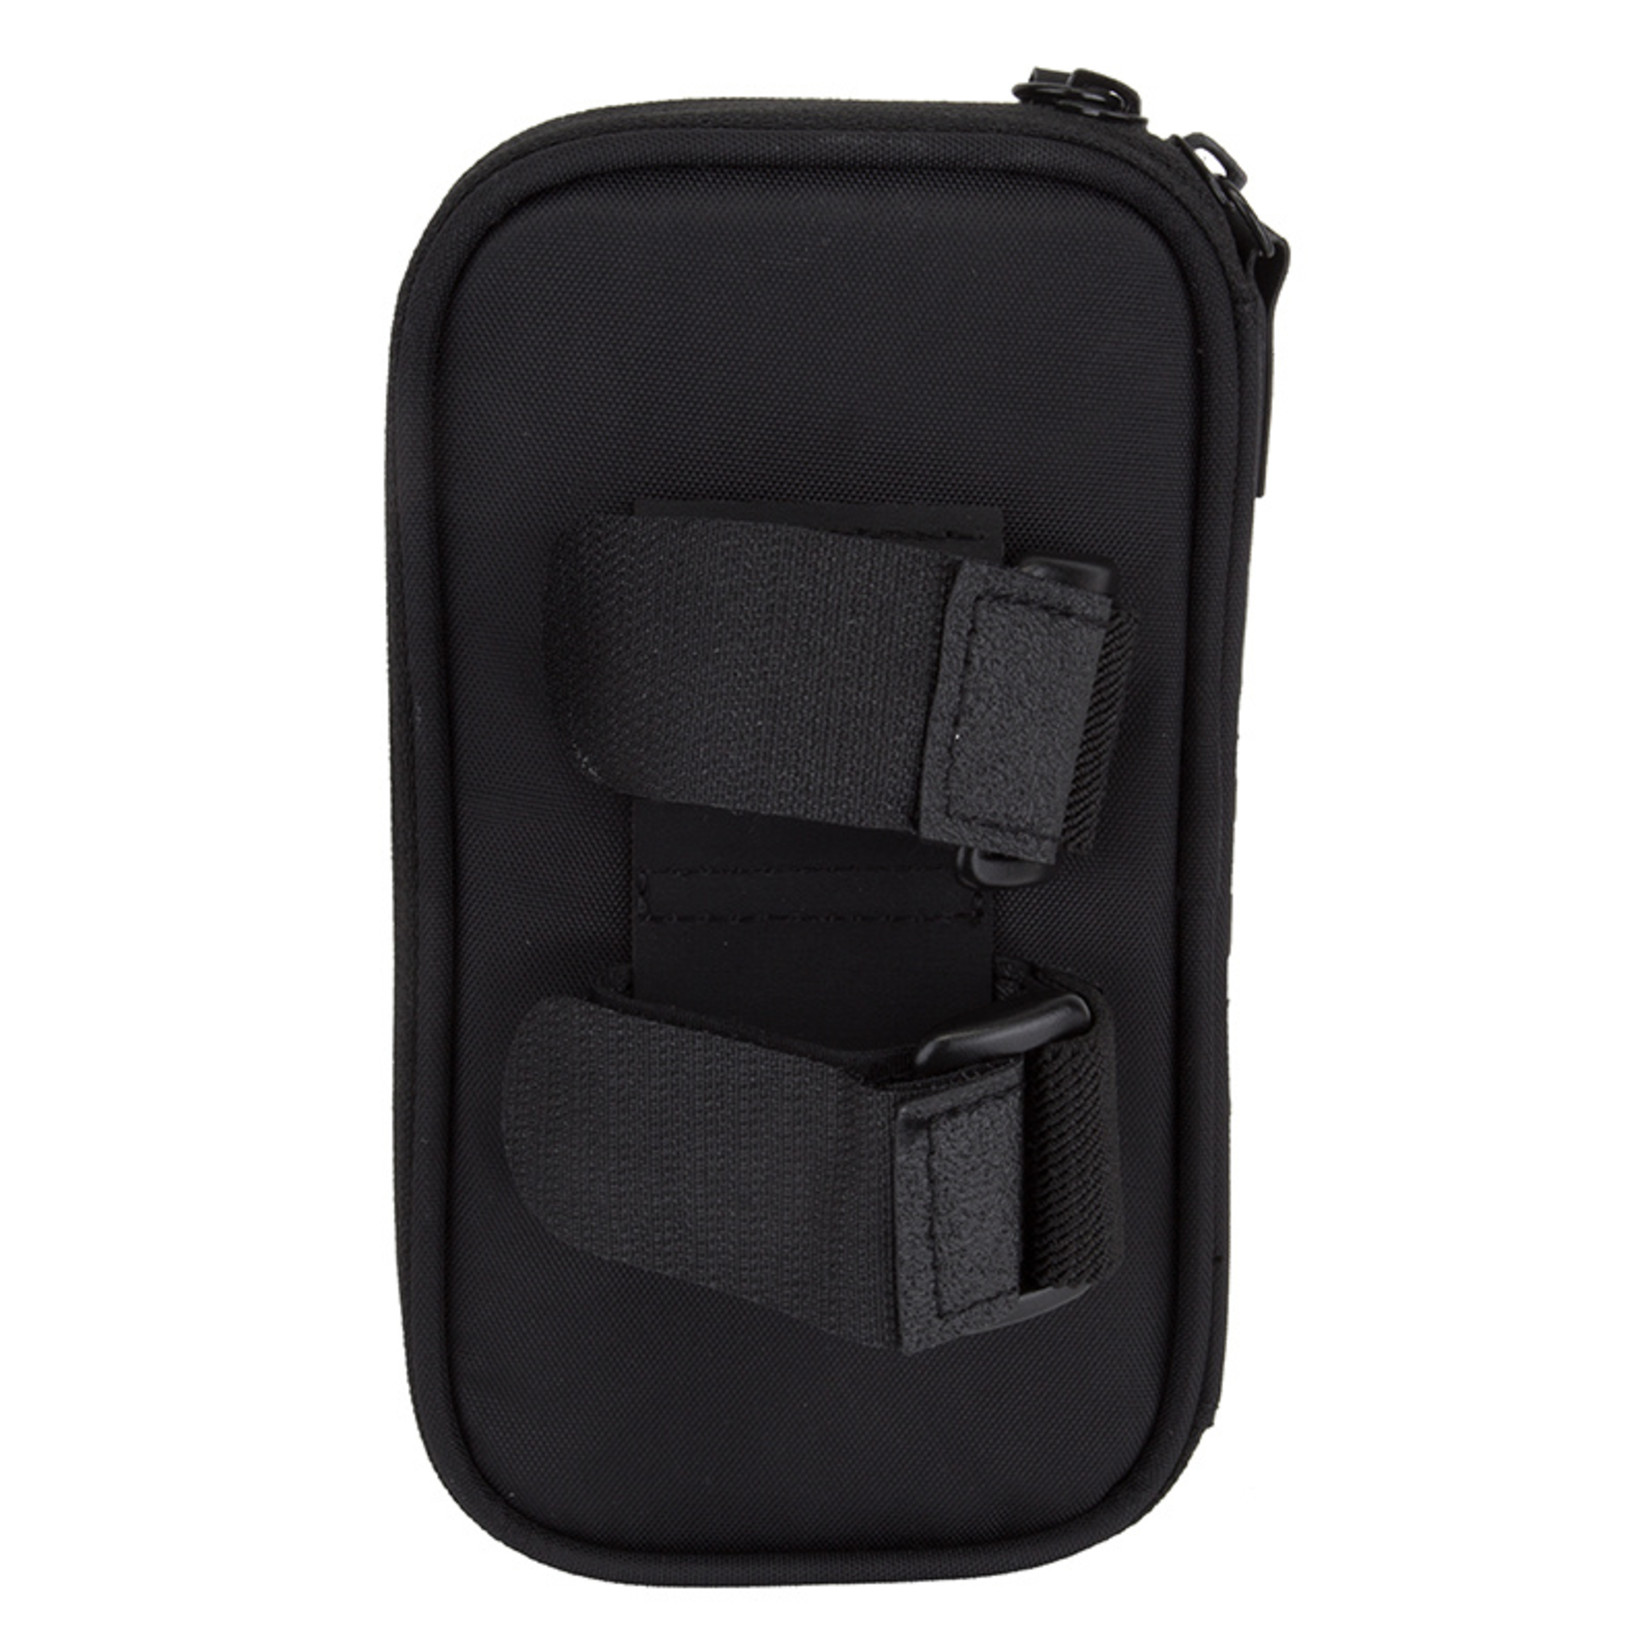 Bikase BAG BIKASE PHONE HANDY ANDY iPHONE 6 BK f/iPHONE 6PLUS-SAMSUNG NOTE